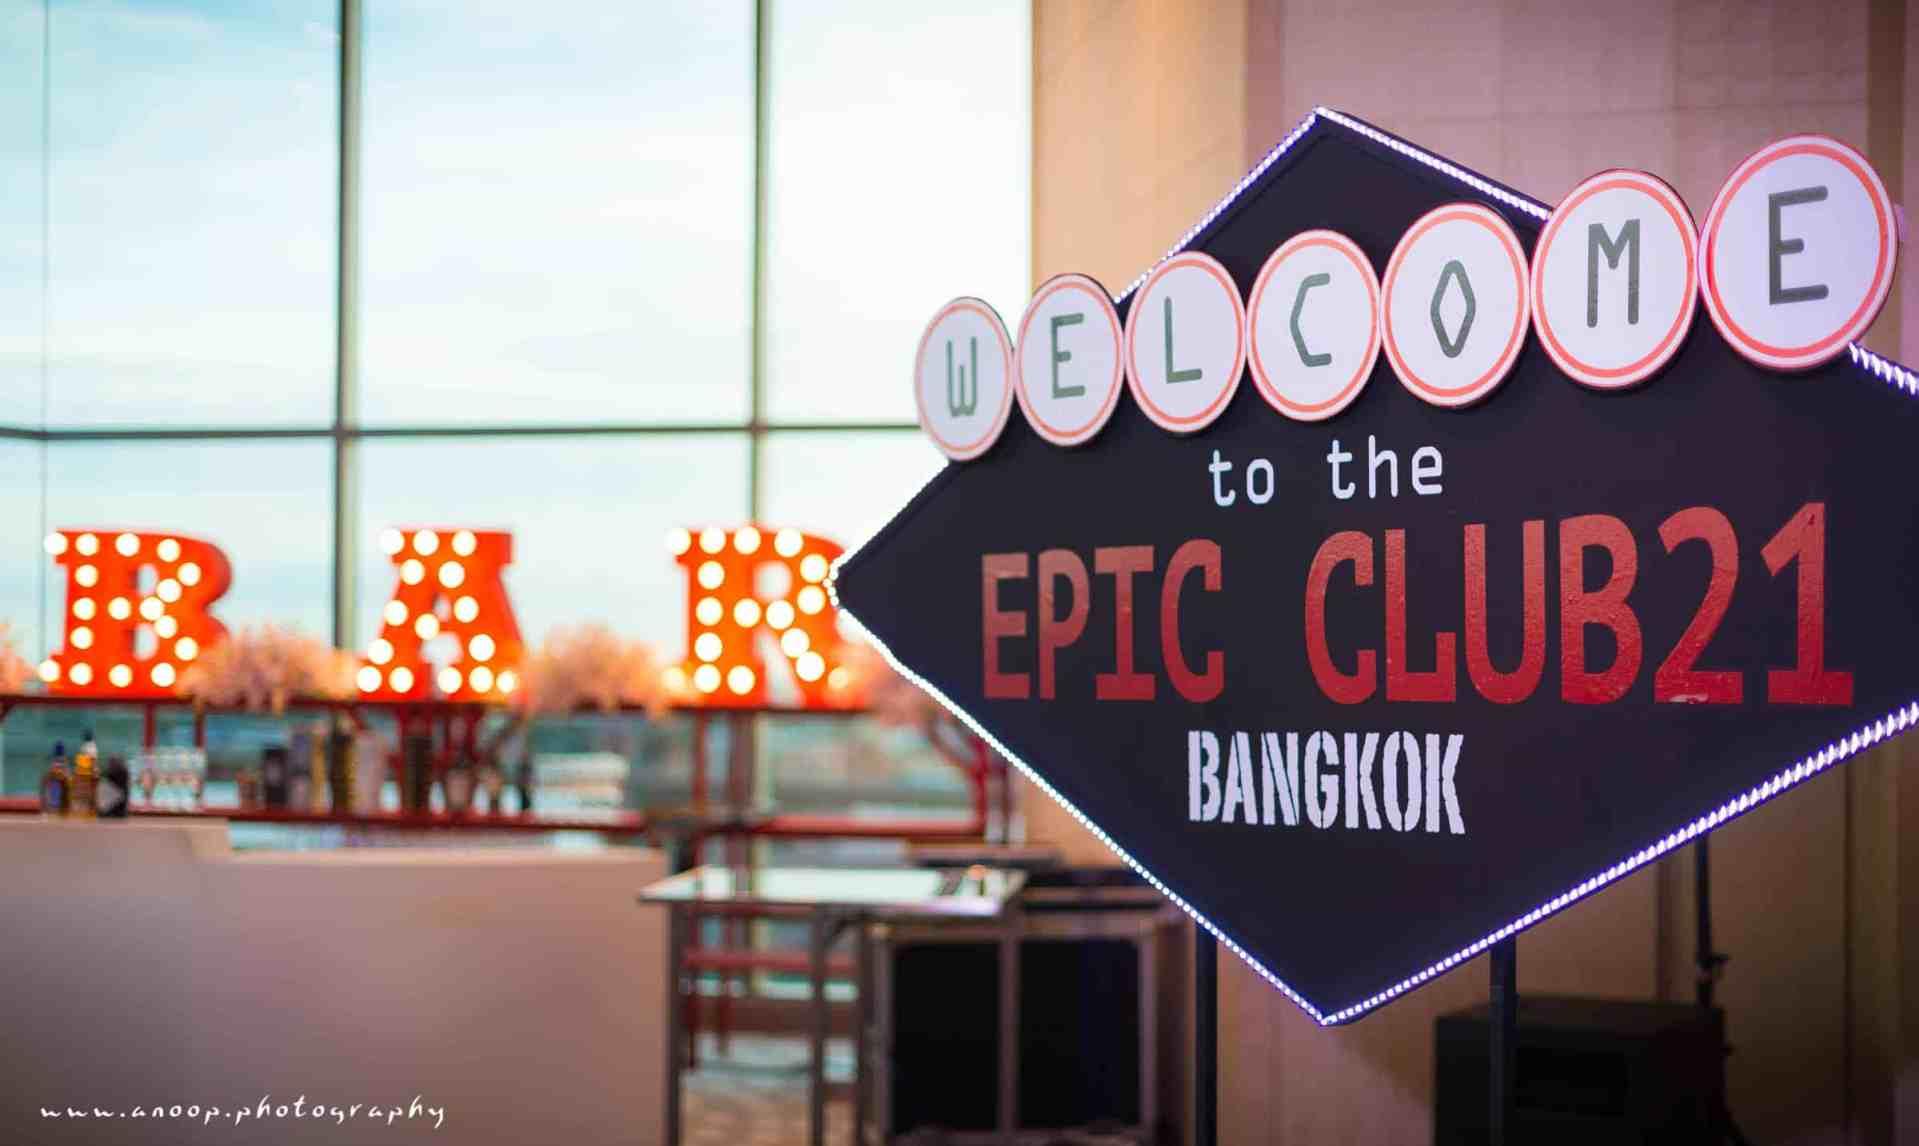 anantara-avani-riverside-bangkok-ballroom-celebrations-4